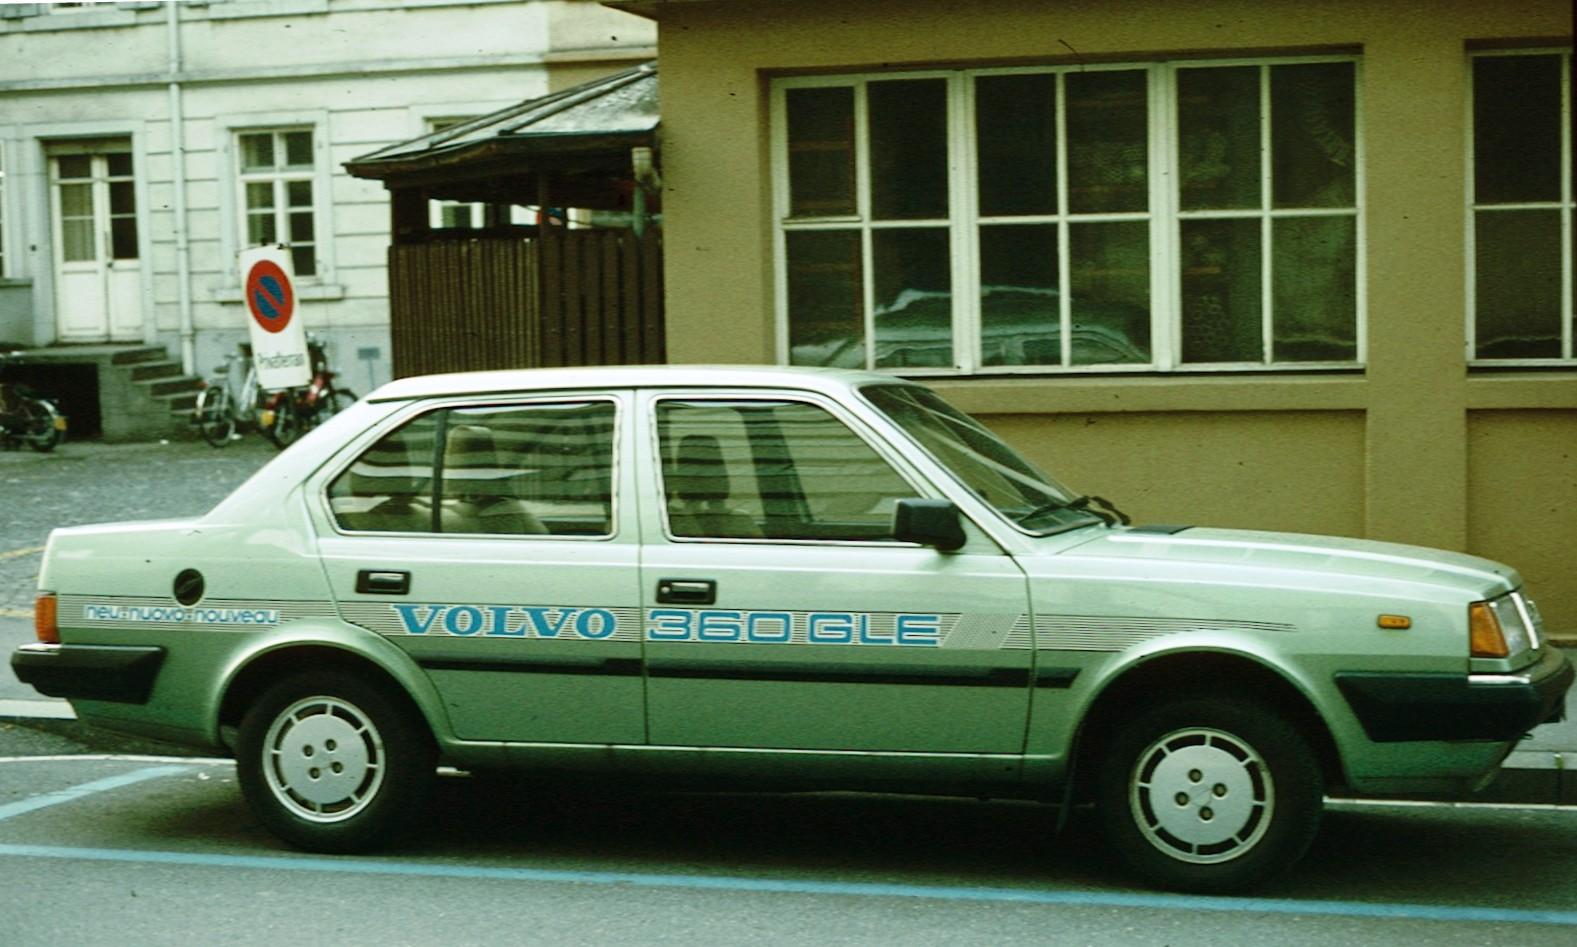 Volvo 300 Series 1975 - 1991 Sedan #6